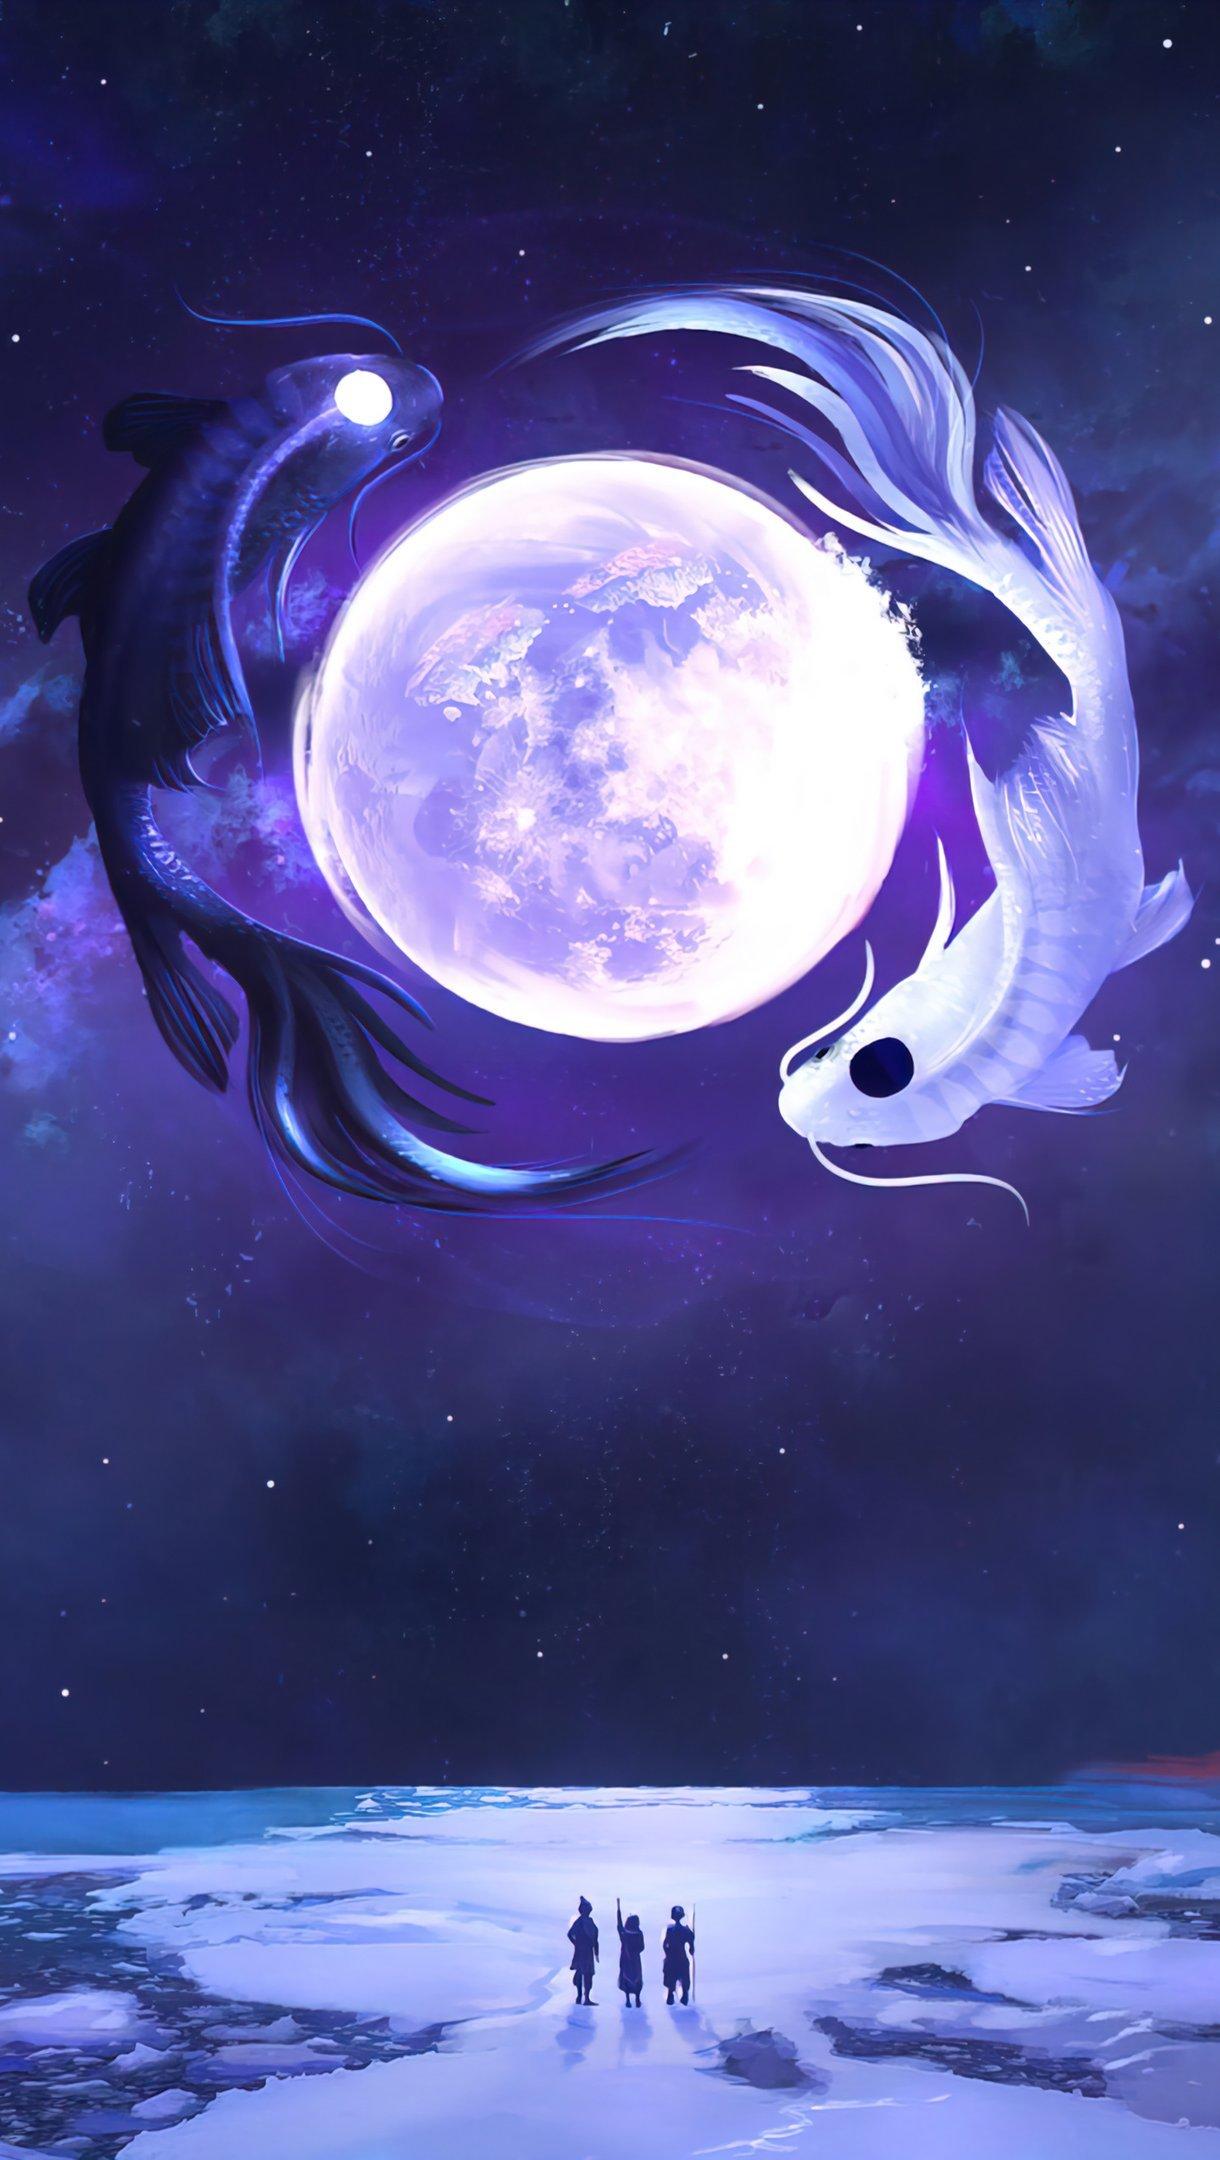 Wallpaper Koi fish at moonlight Vertical